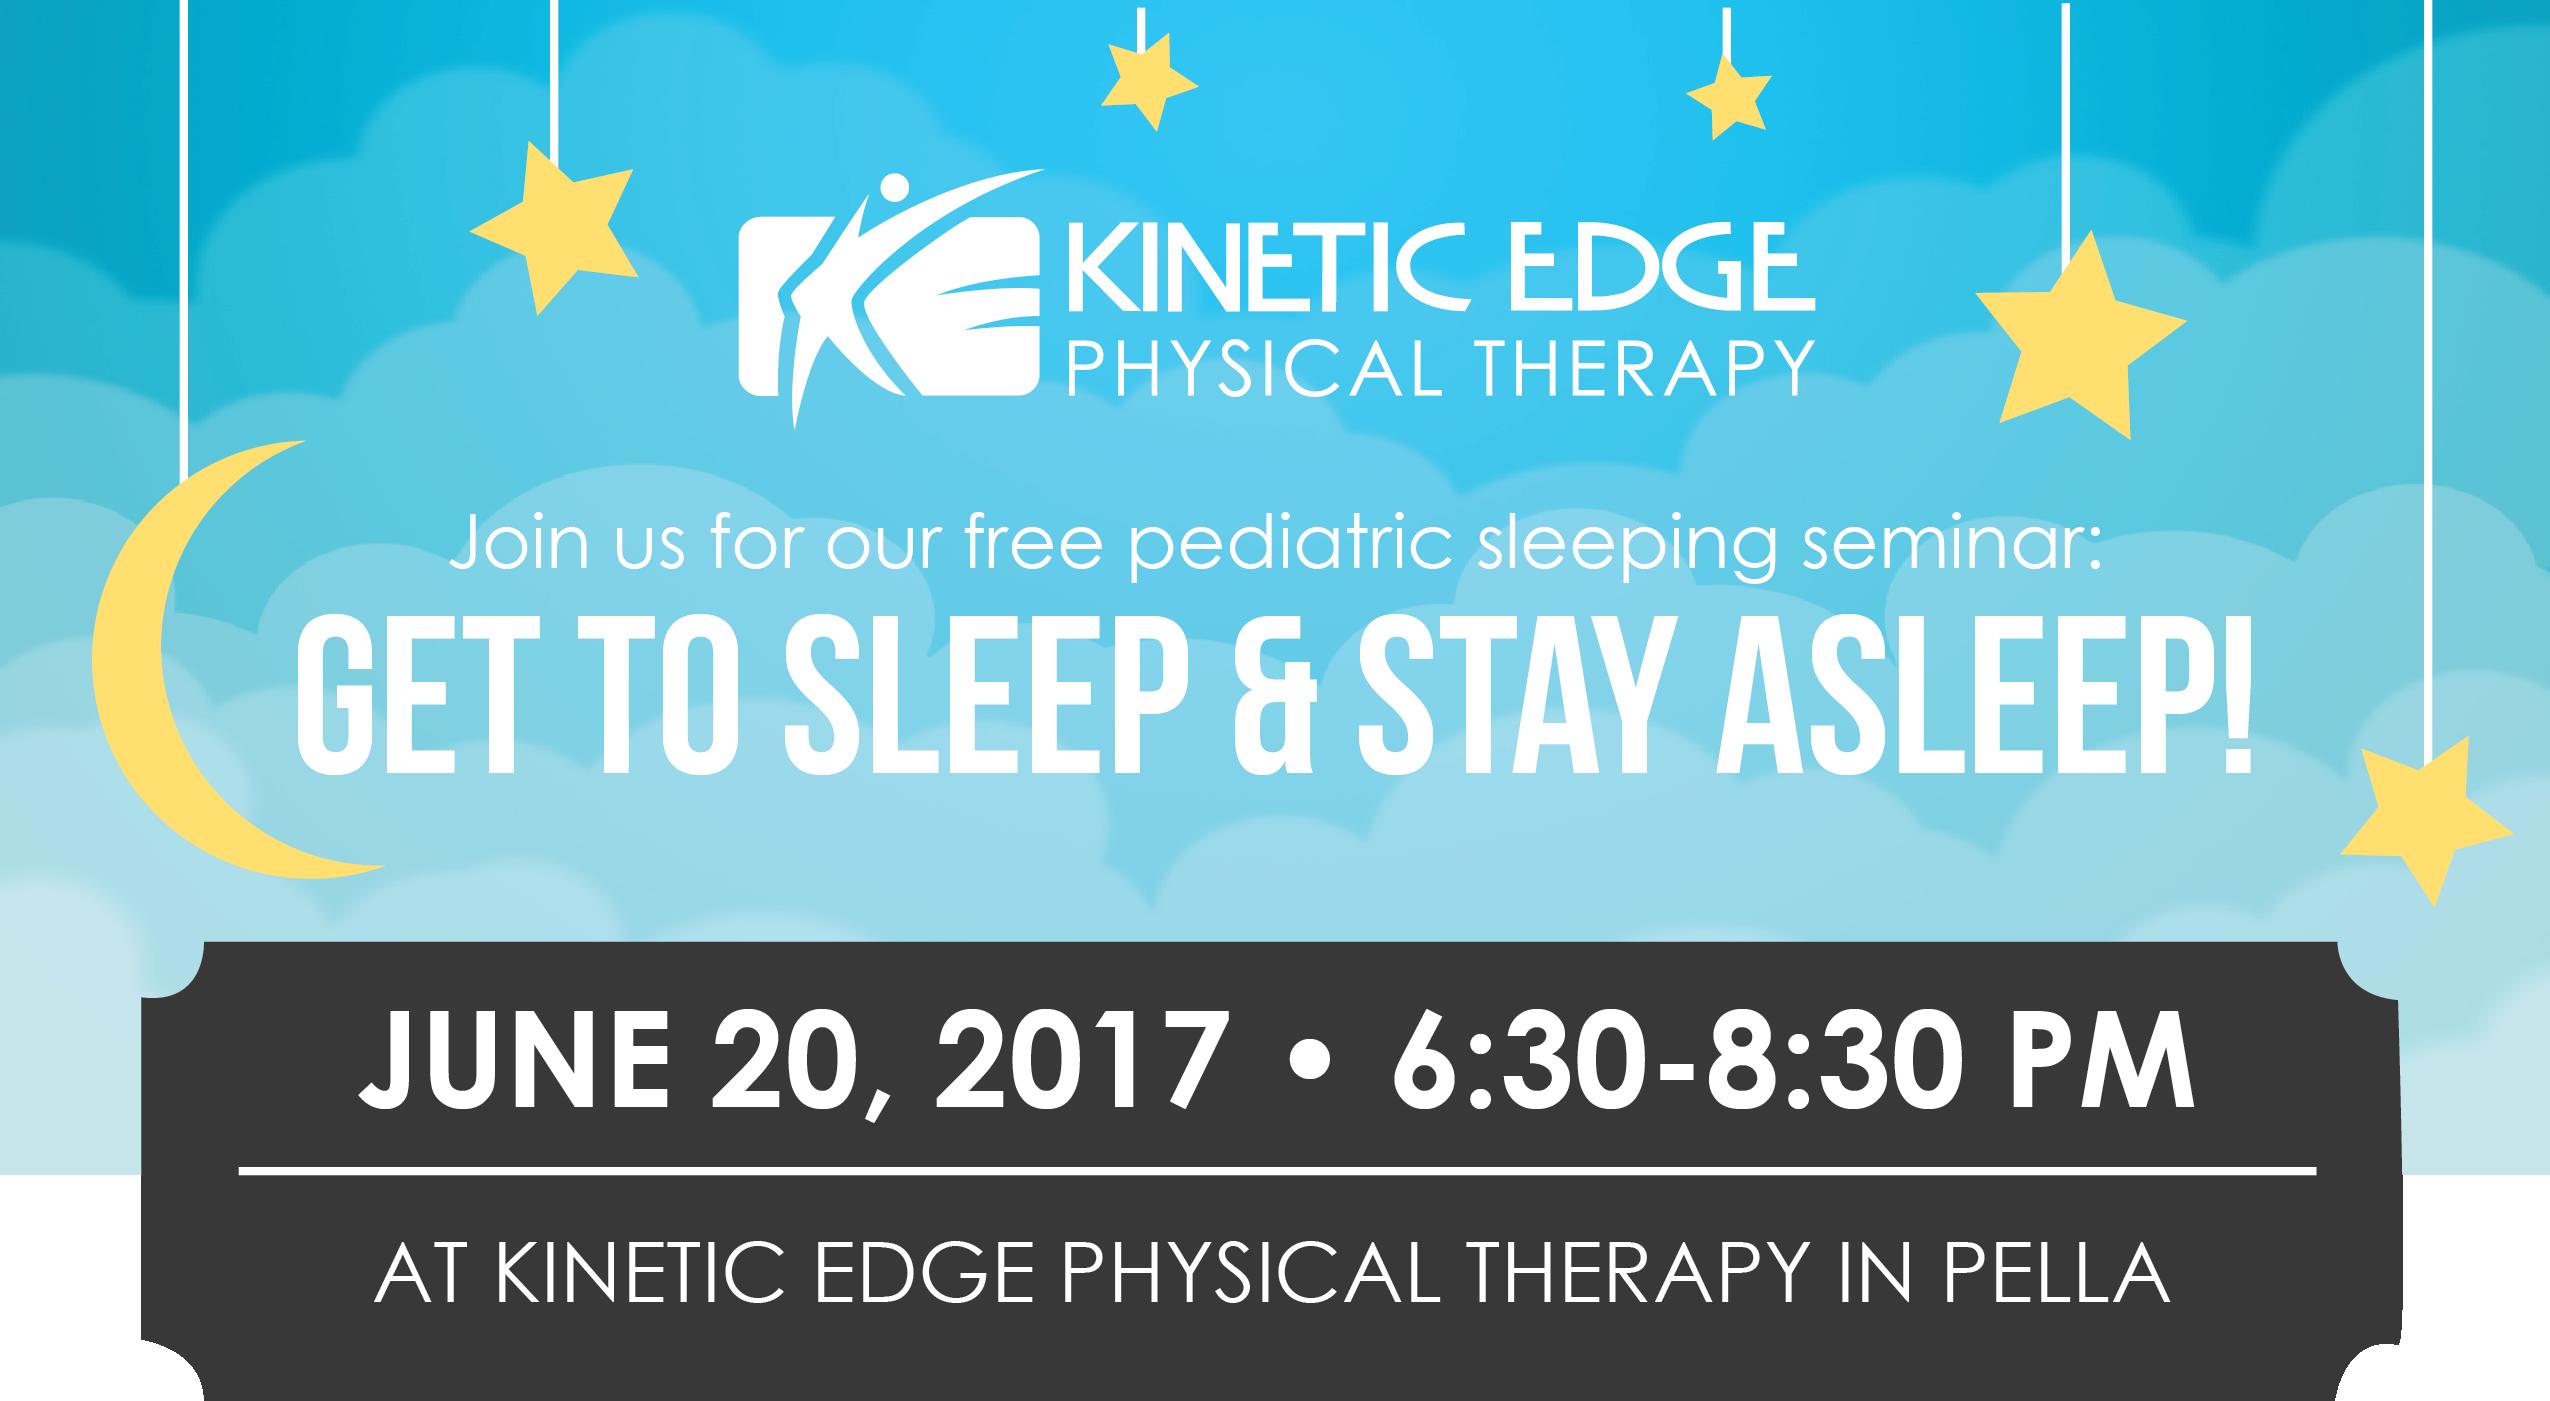 Sleep seminar